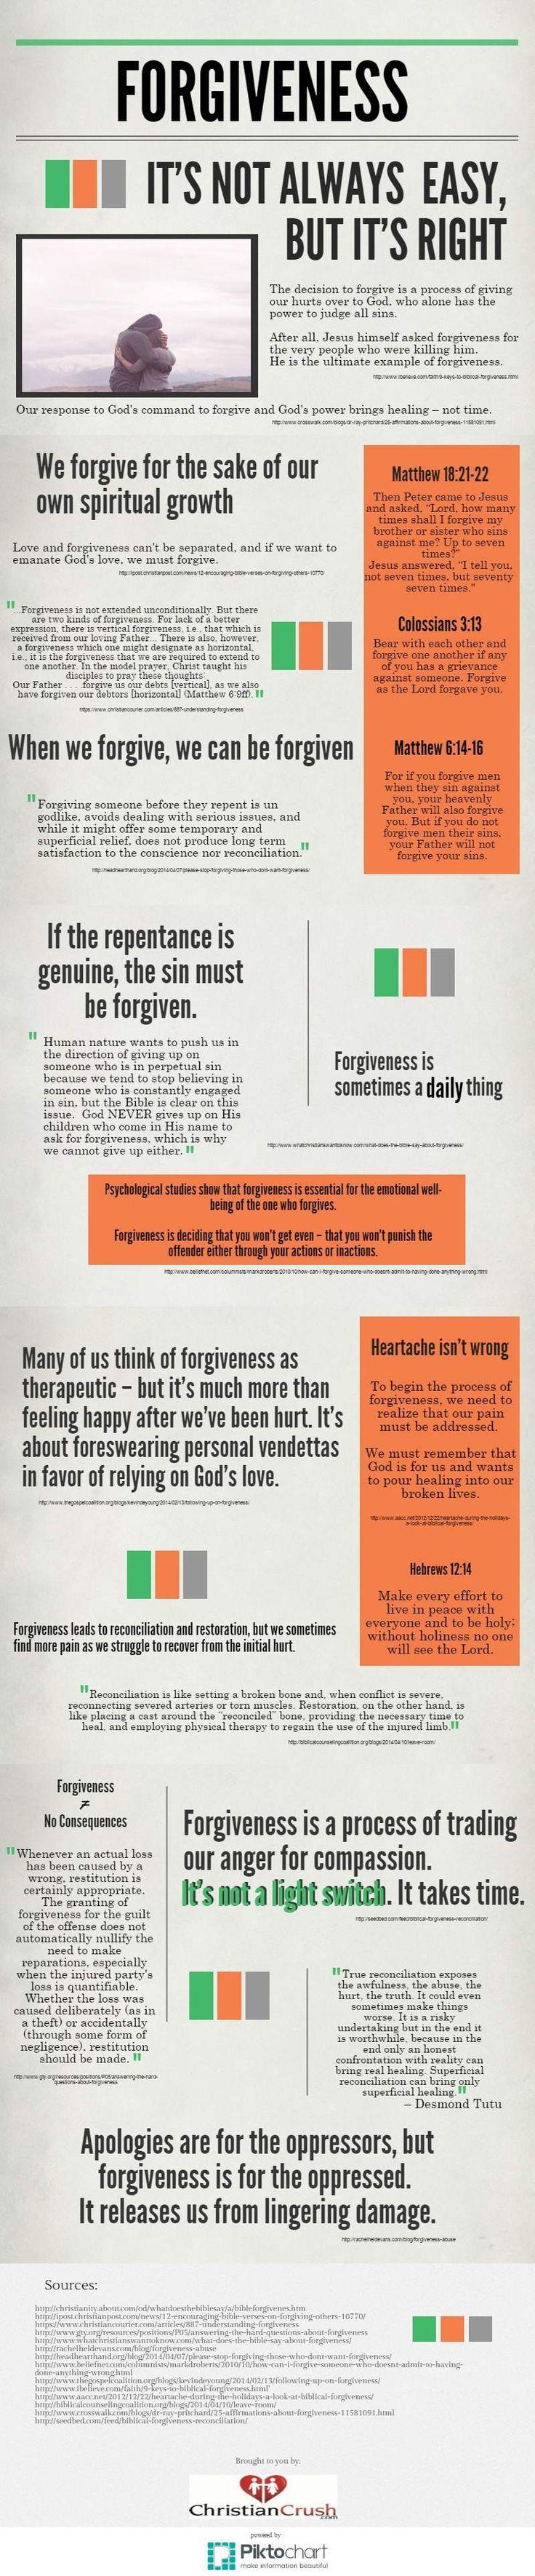 reversing unforgiveness